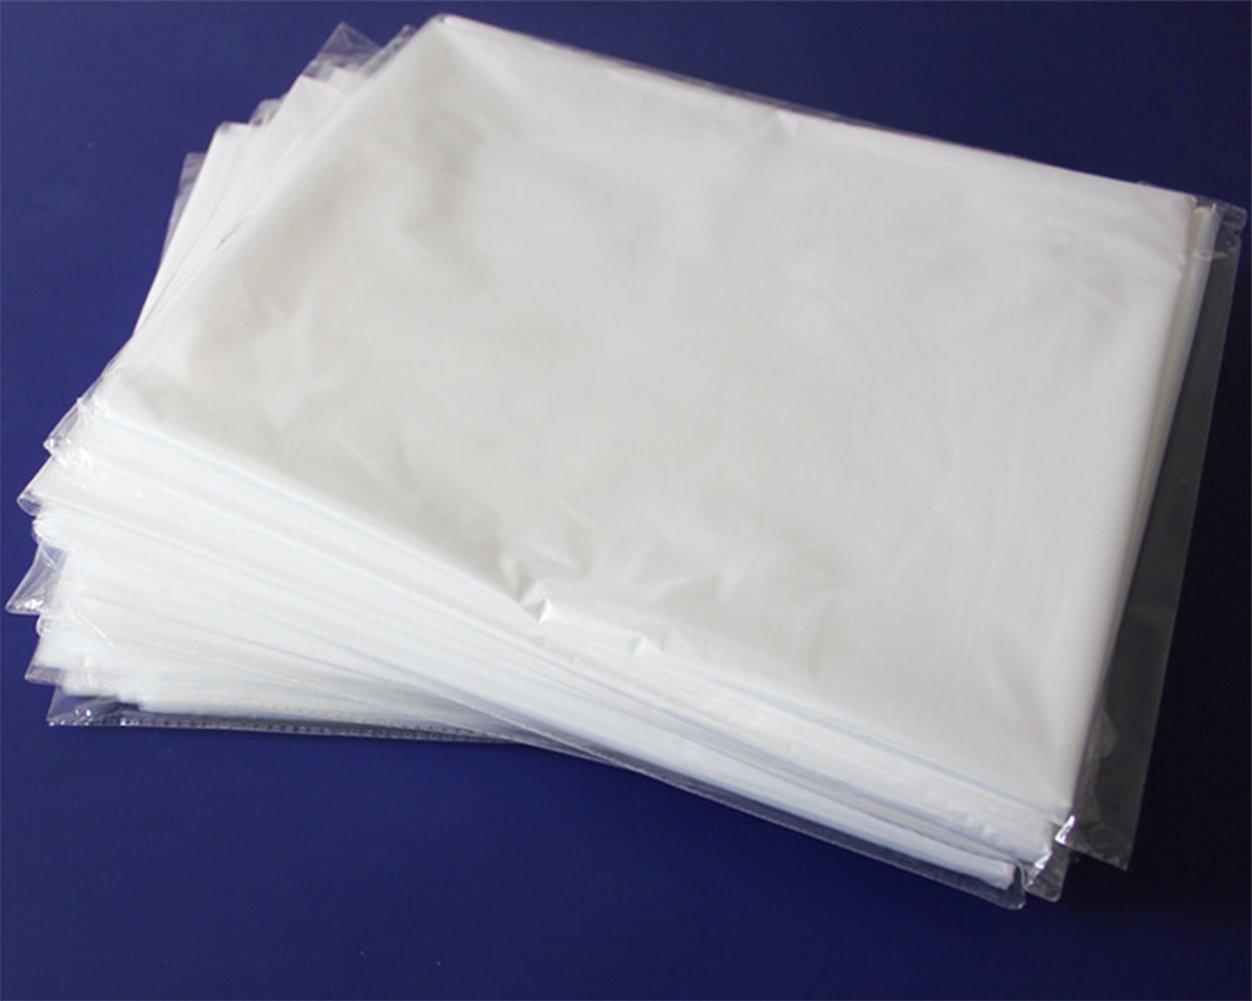 40pcs Dust Cover Garment Storage Organizer Bag Wardrobe Hanging Clothes (40pcs) by Risesun (Image #6)